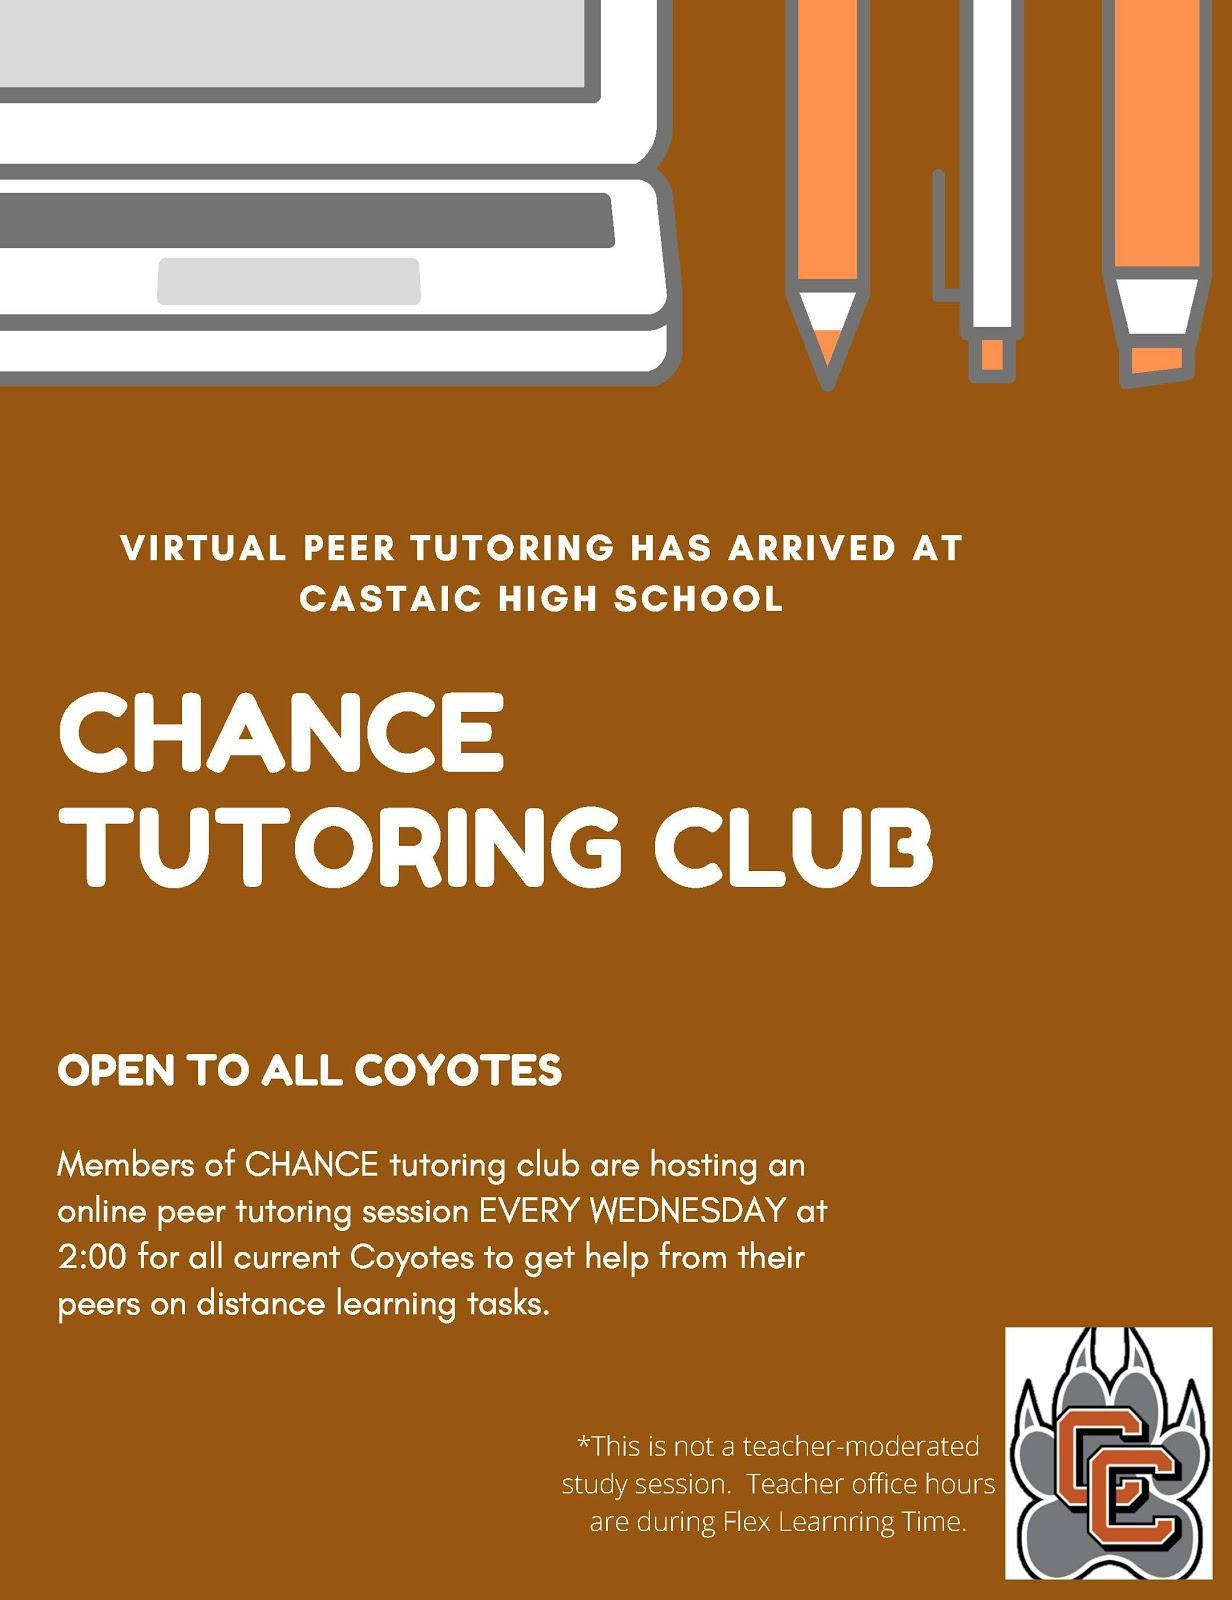 Chance Peer Tutoring Club